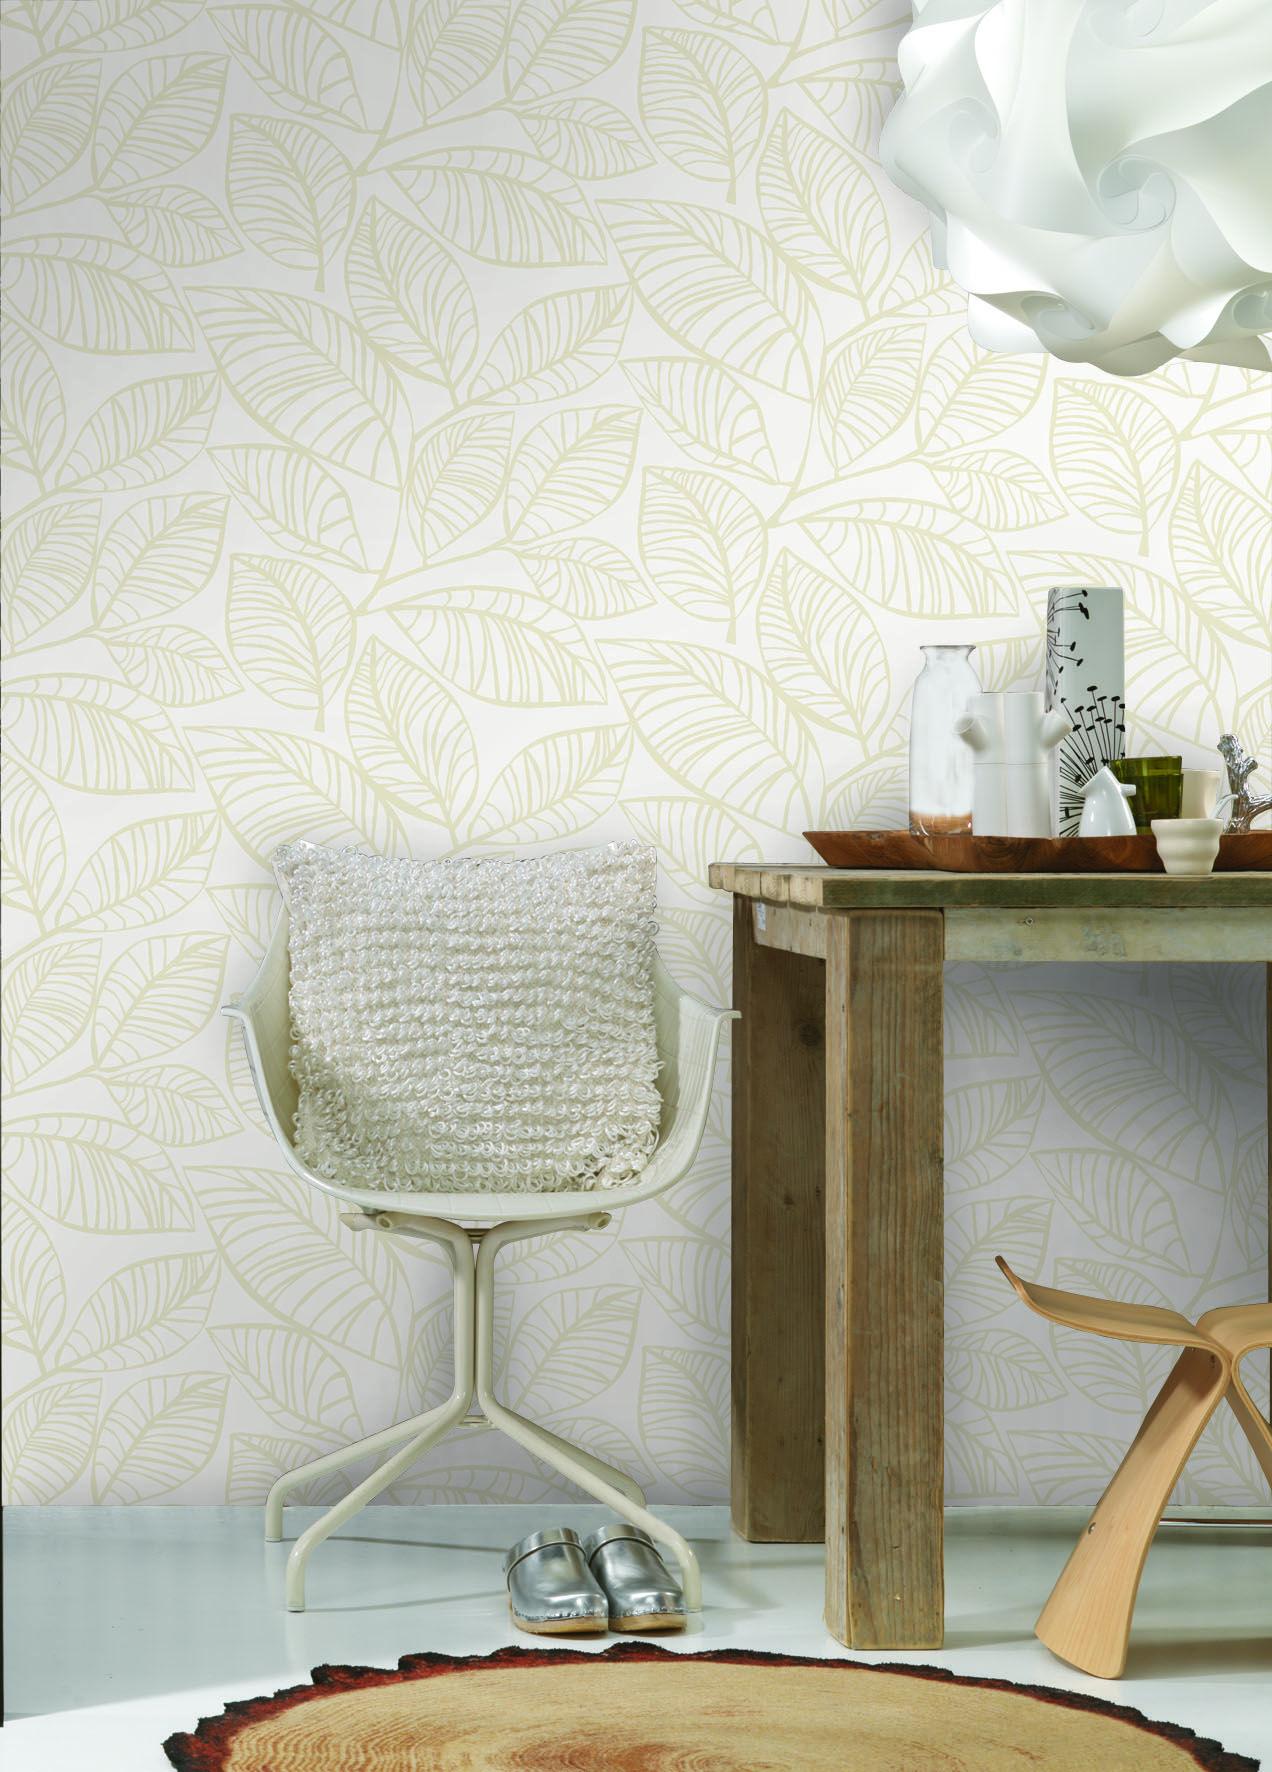 4706 2 Papeles Pinterest Papel Decorativo Papel Y Productos # Muebles Empapelados